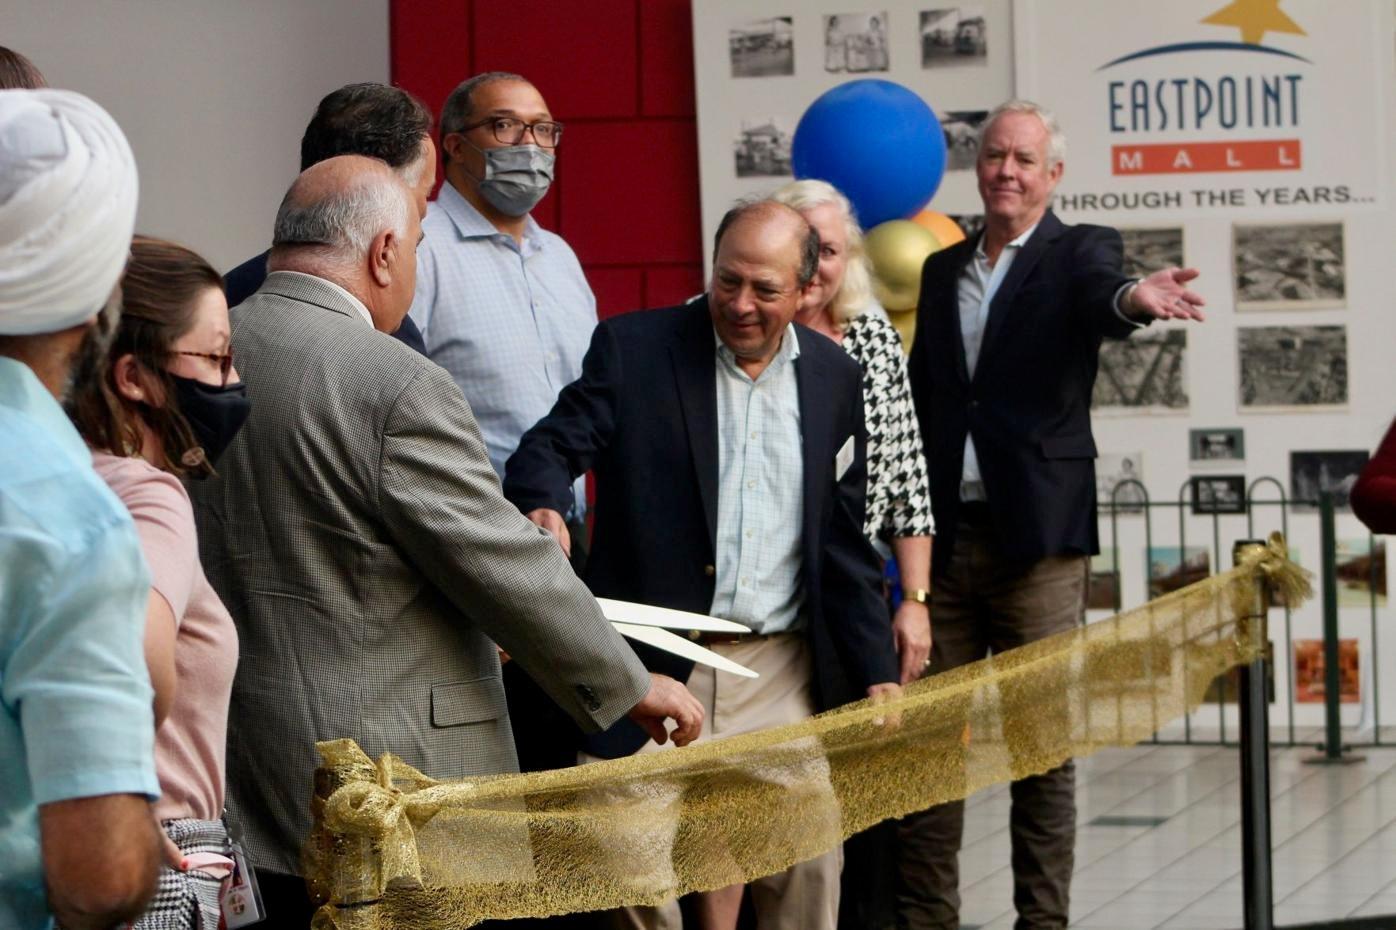 Eastpoint Mall turns 65